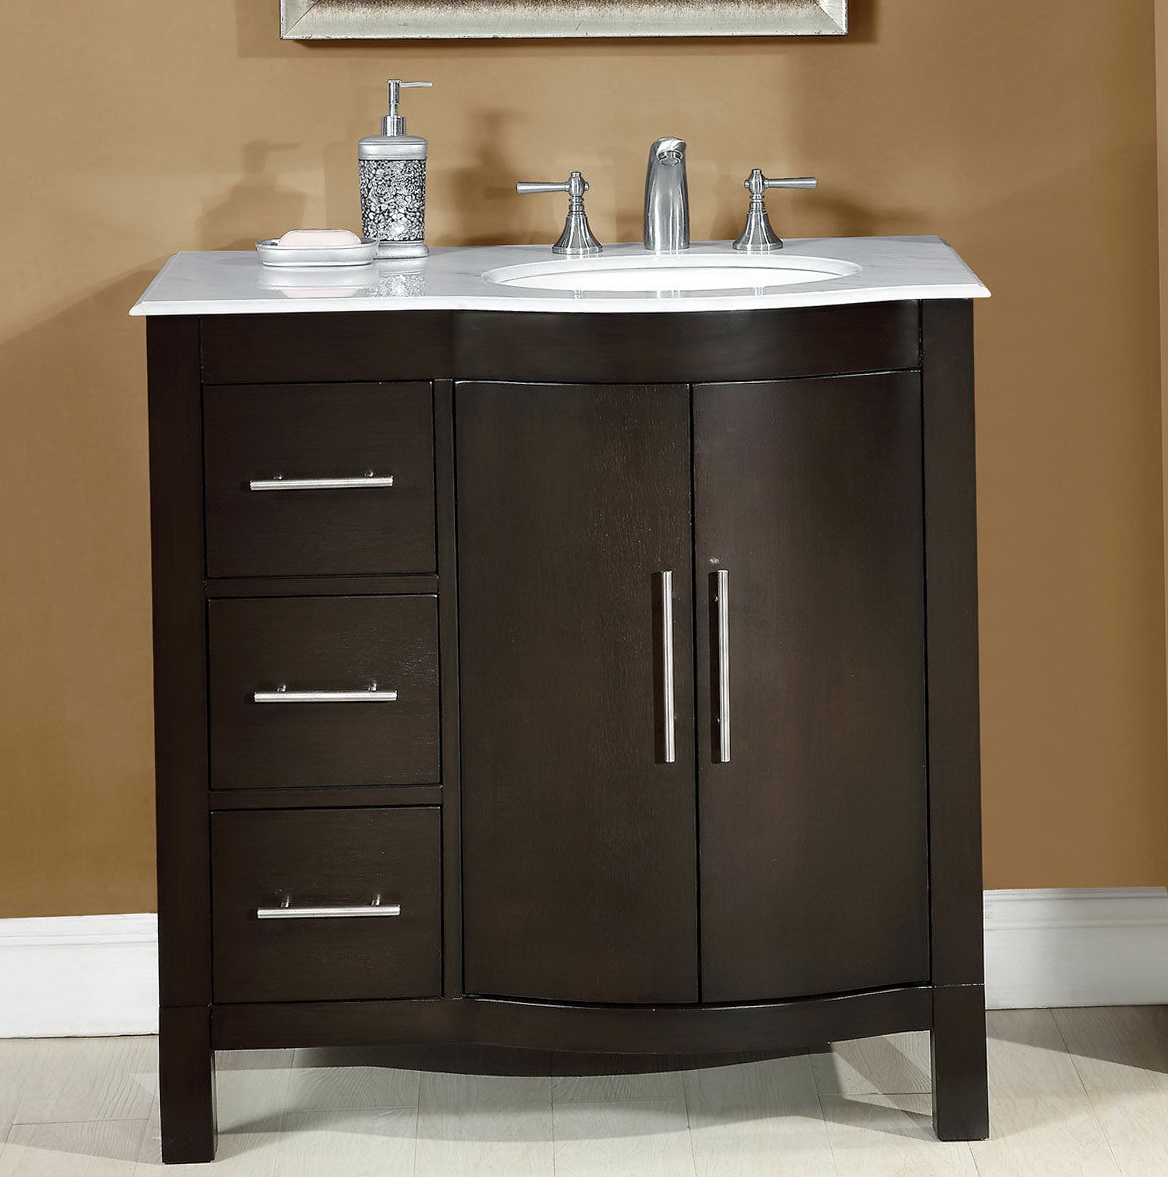 bathroom vanity with sink on right side home design ideas. Black Bedroom Furniture Sets. Home Design Ideas